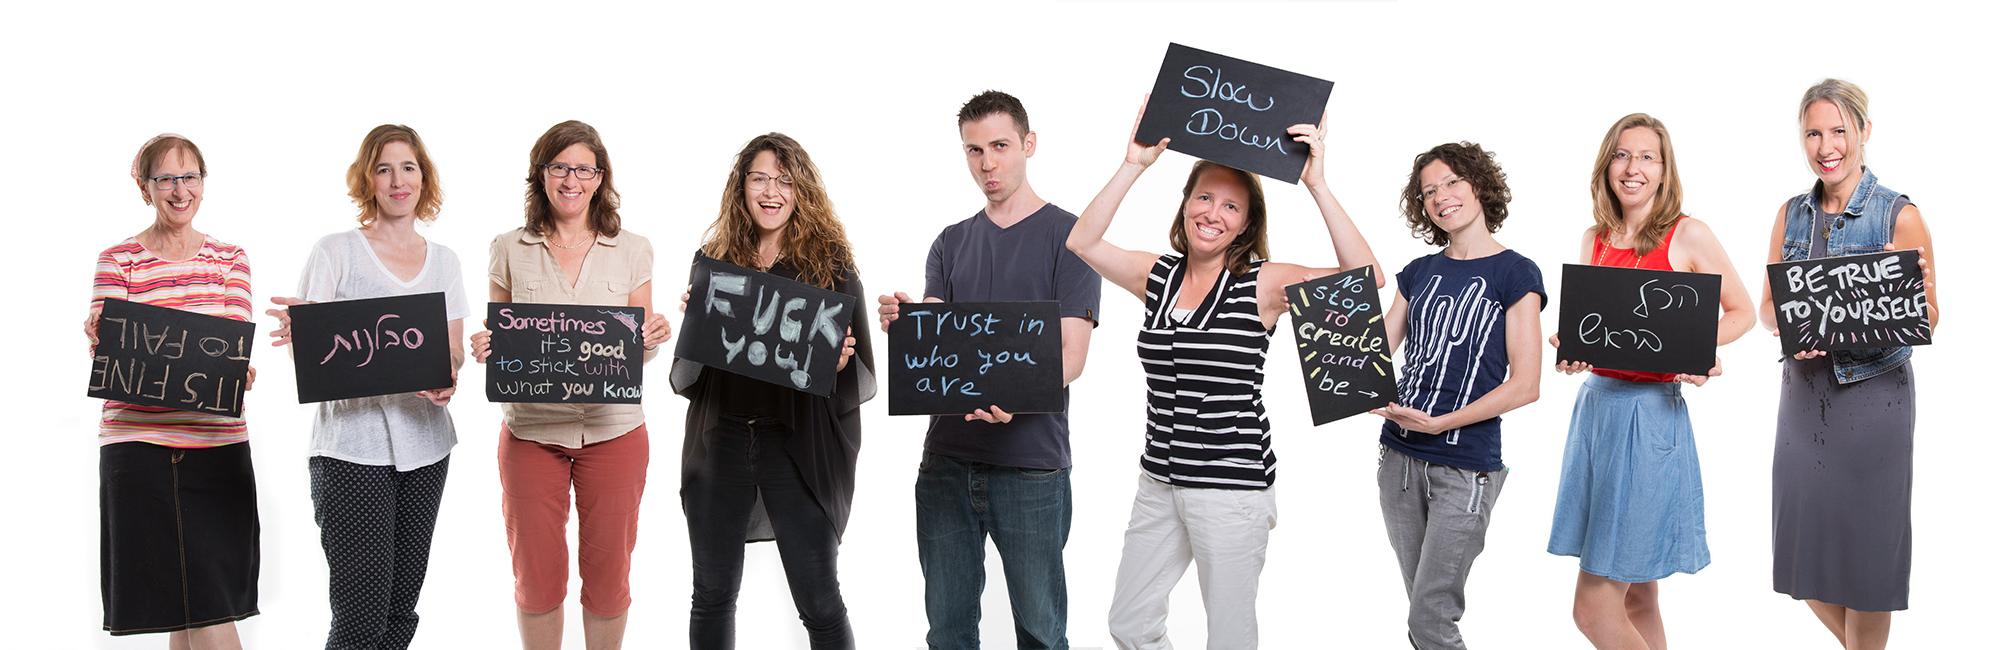 Marketing Team at Clicktale